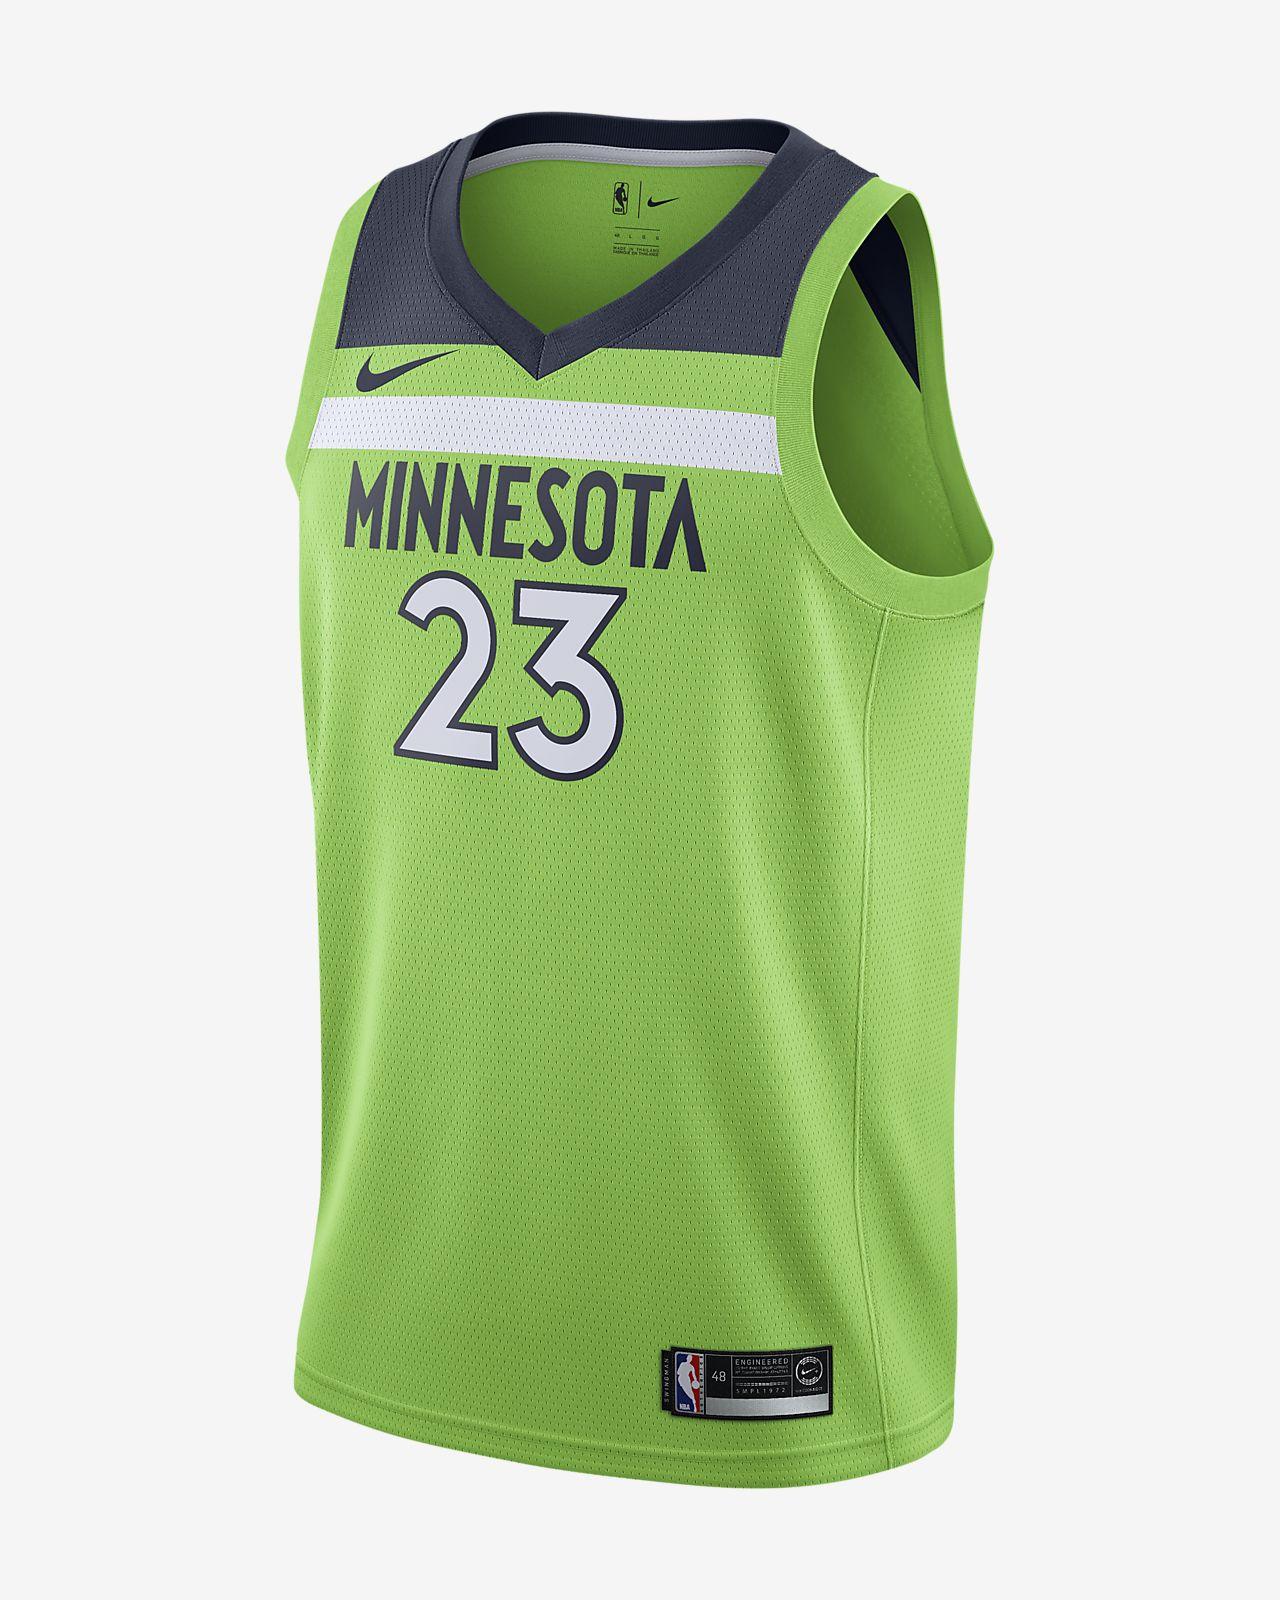 Camiseta conectada Nike NBA para hombre Jimmy Butler Statement Edition Swingman (Minnesota Timberwolves)